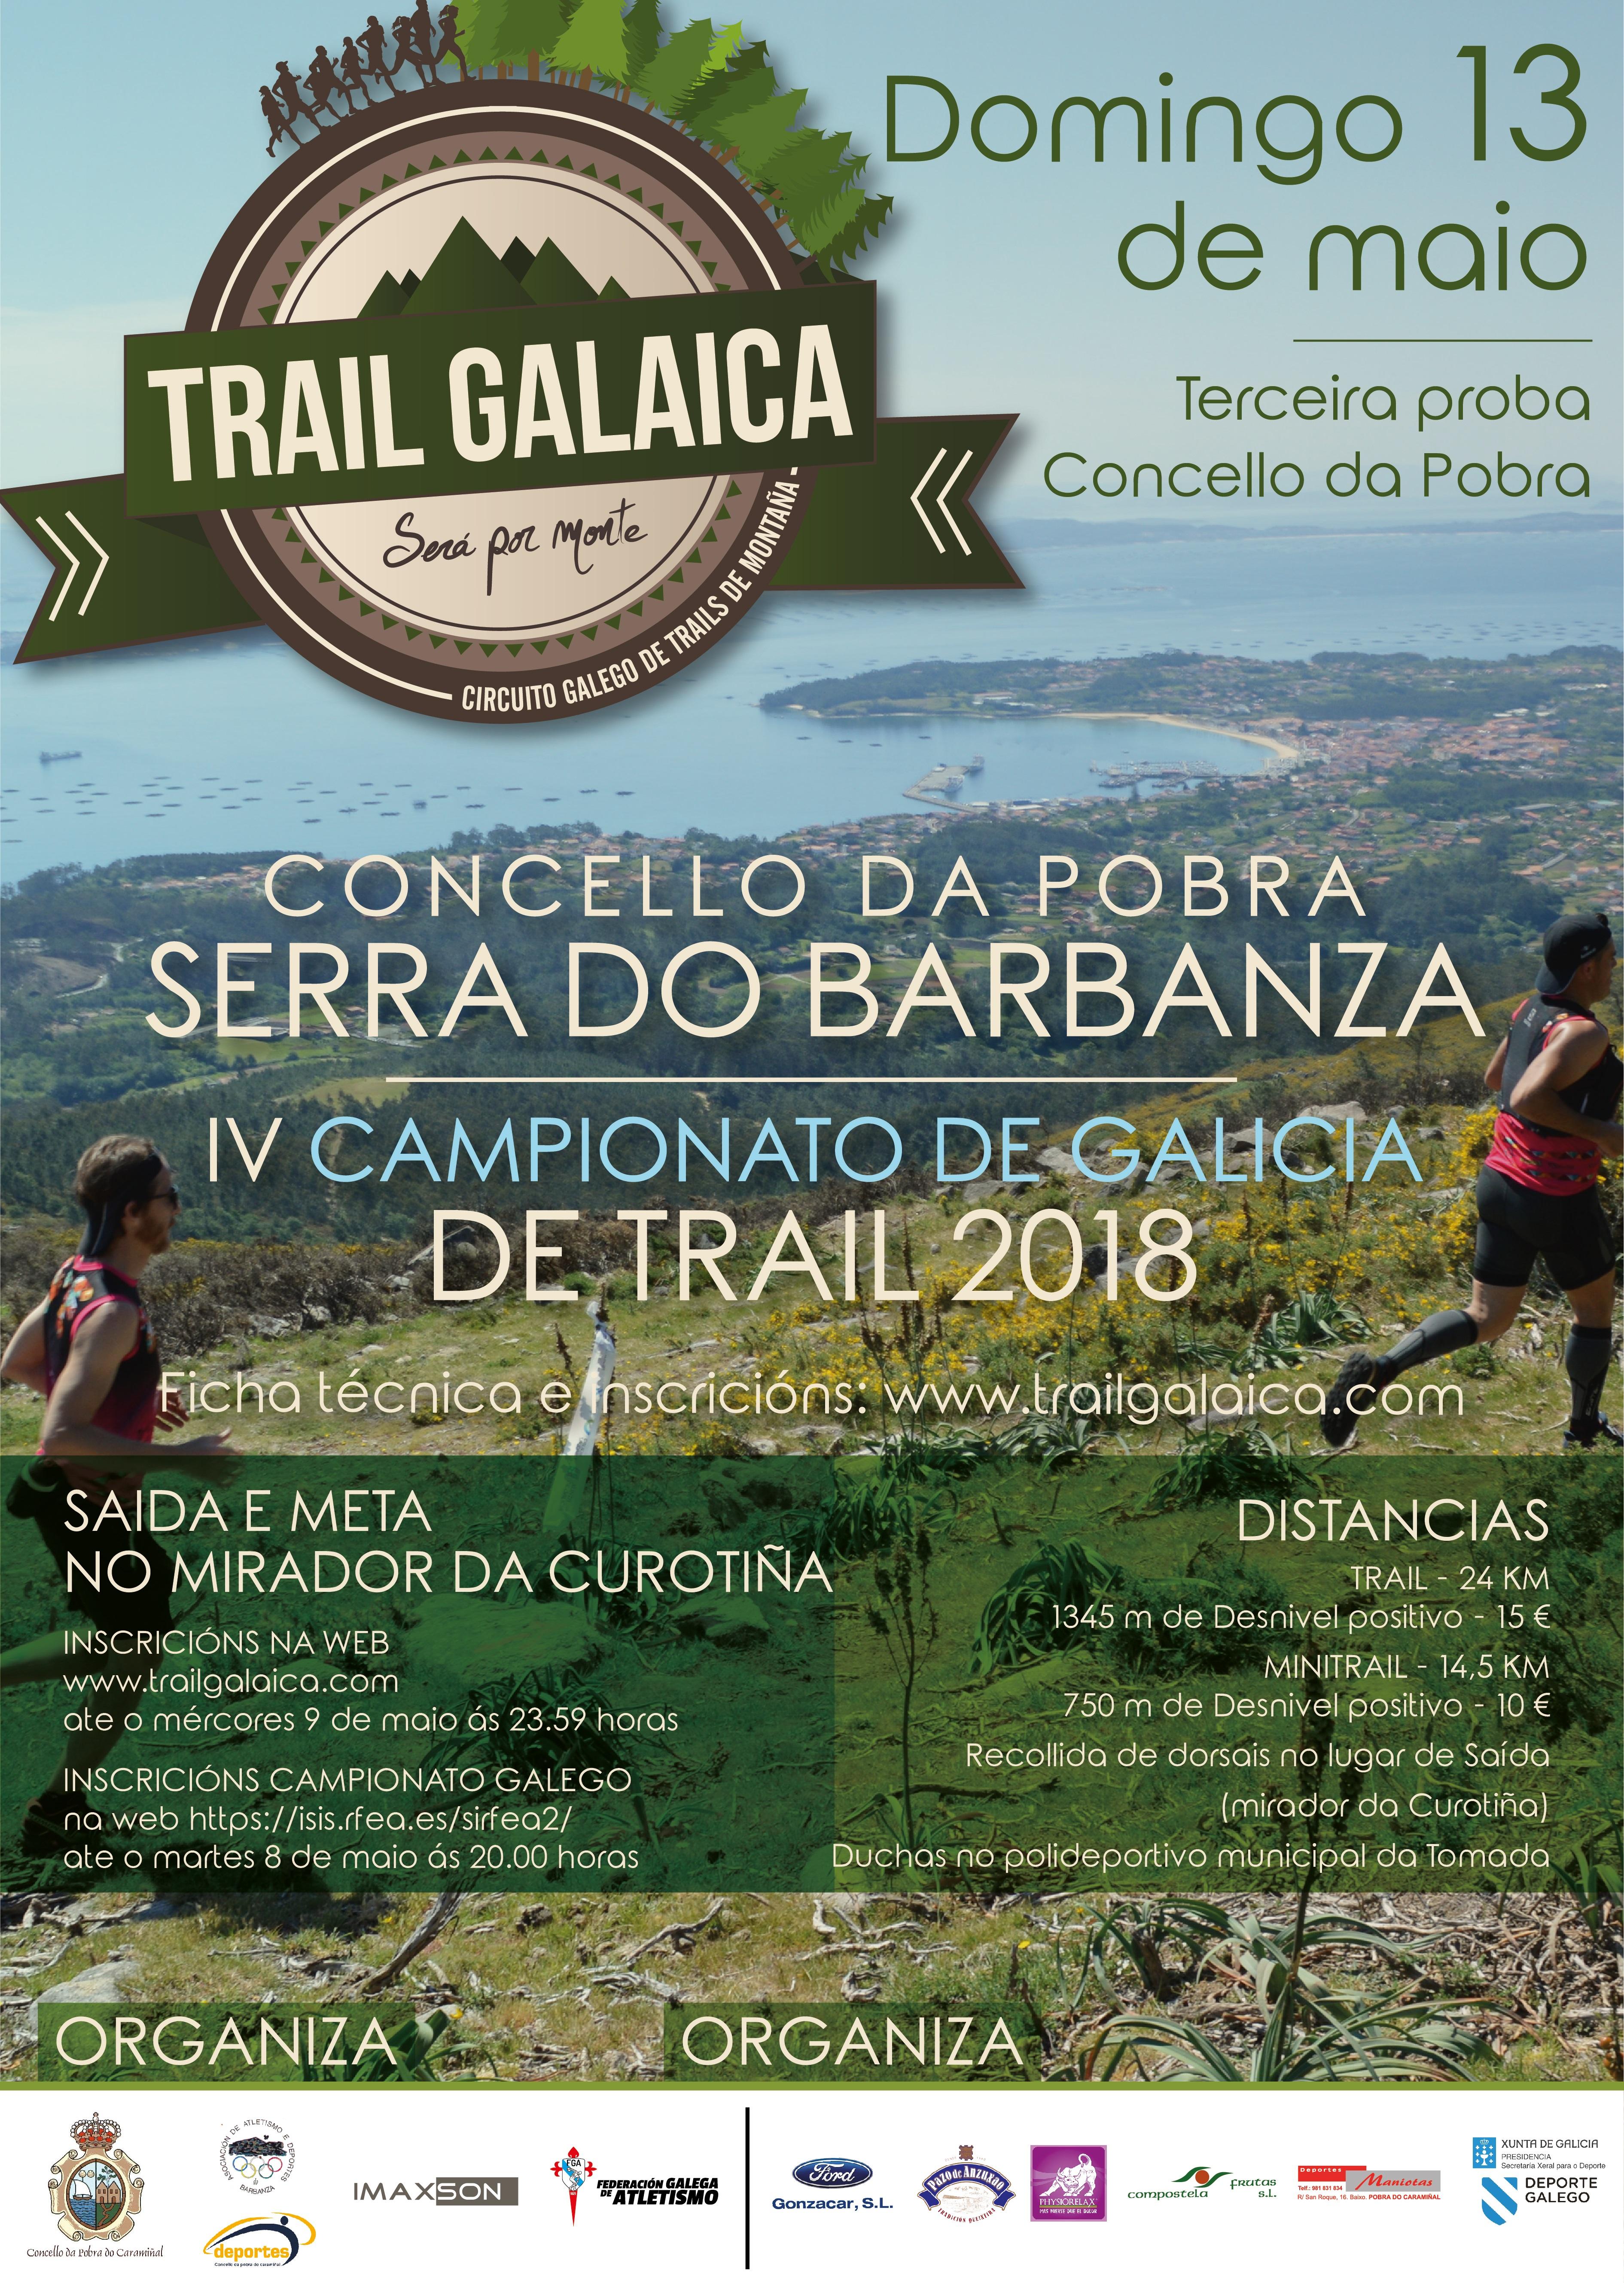 IV Campionato de Galicia de Trail